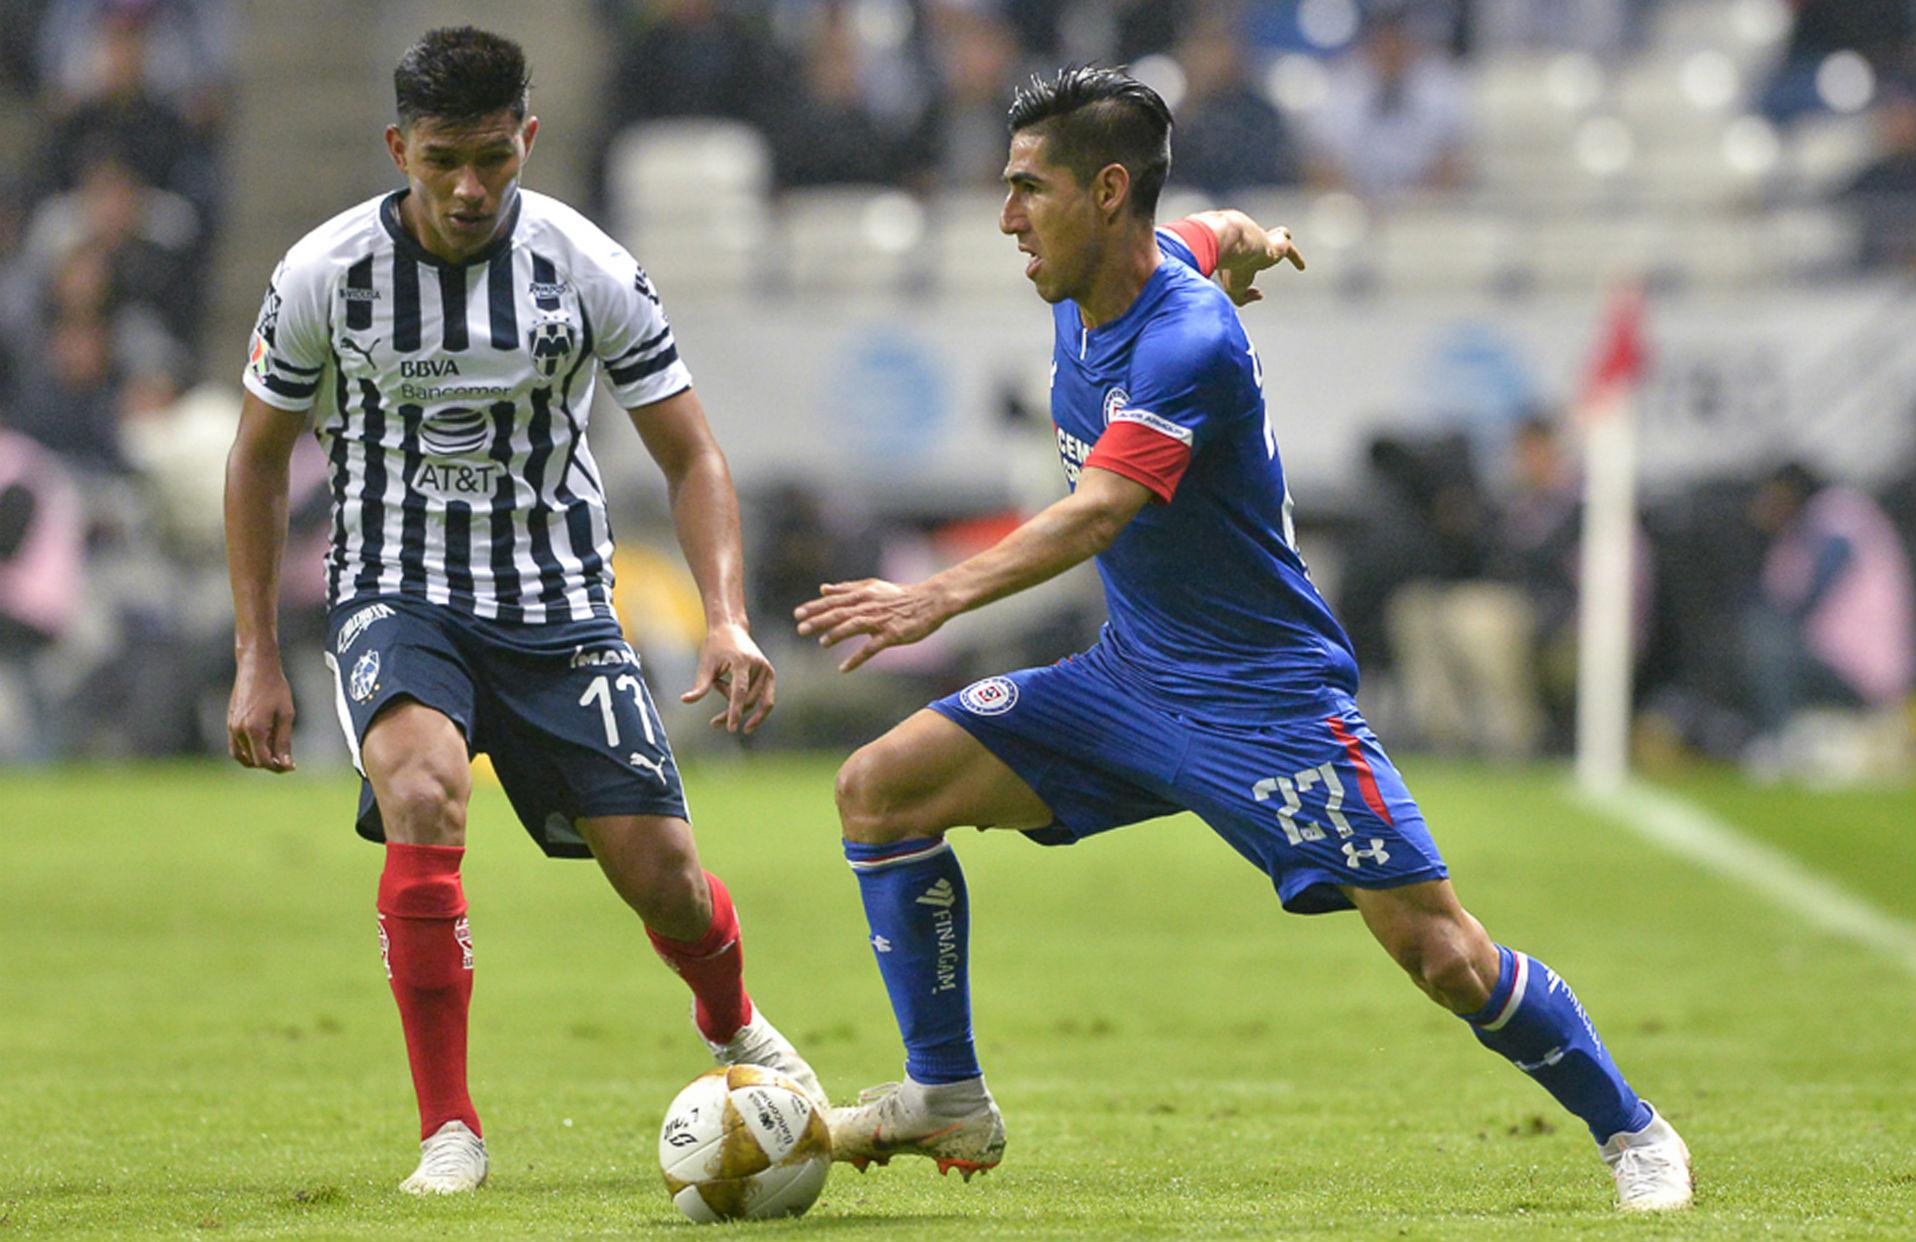 Monterrey Cruz Azul José Madueña Jesús Gallardo